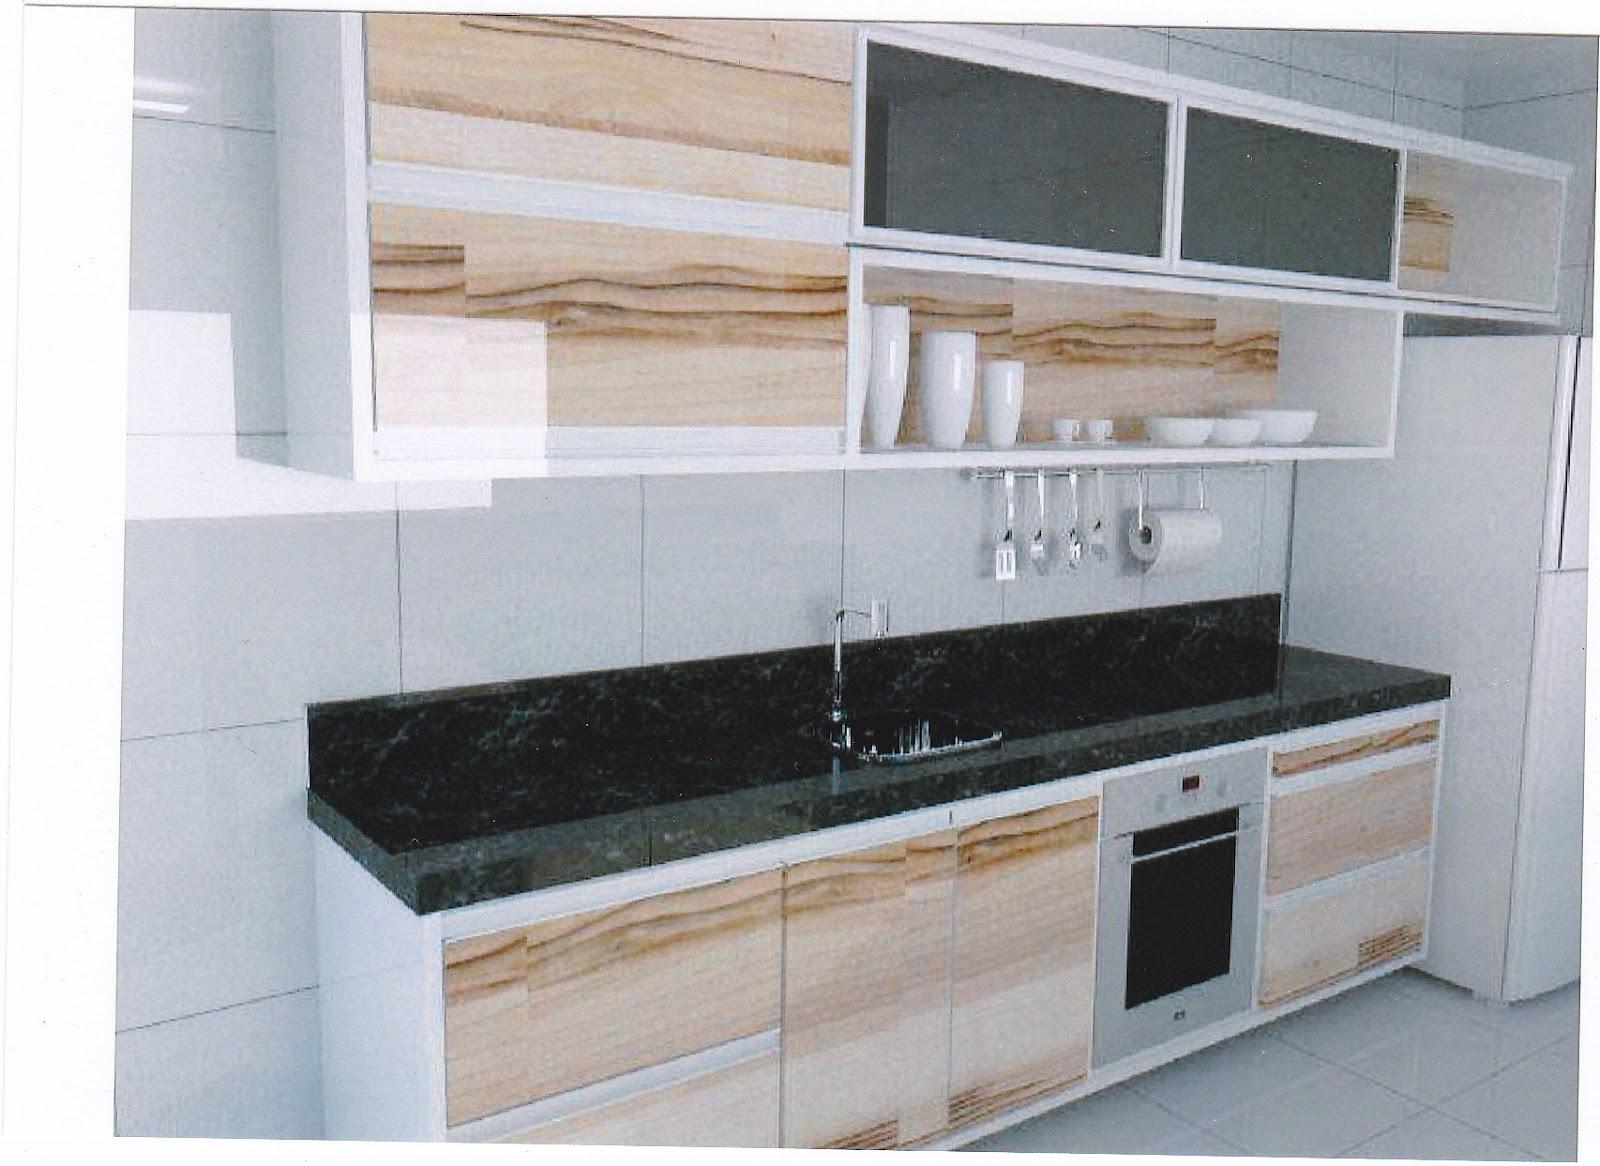 armarios para cozinhas modernas source crazygallery info armarios #836648 1600 1166